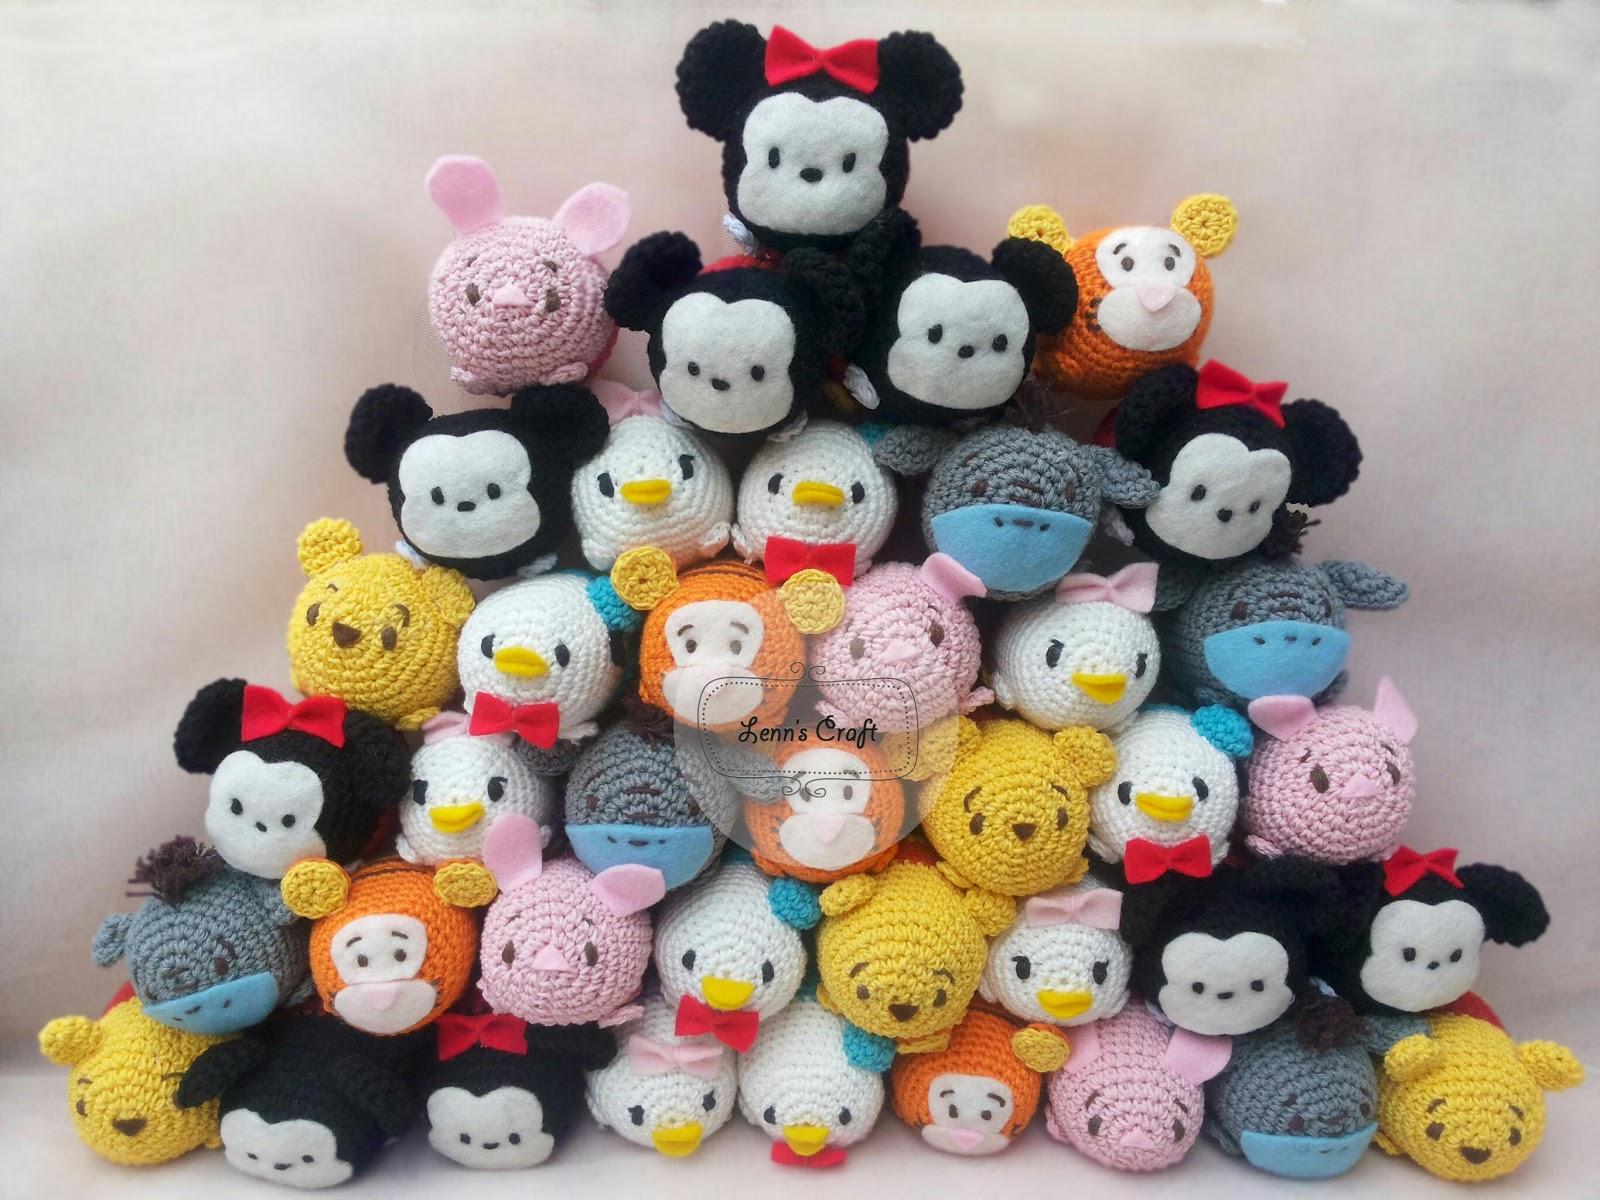 Lenns Craft ? Handmade doll? Amigurumi ? : Tsum tsum ...